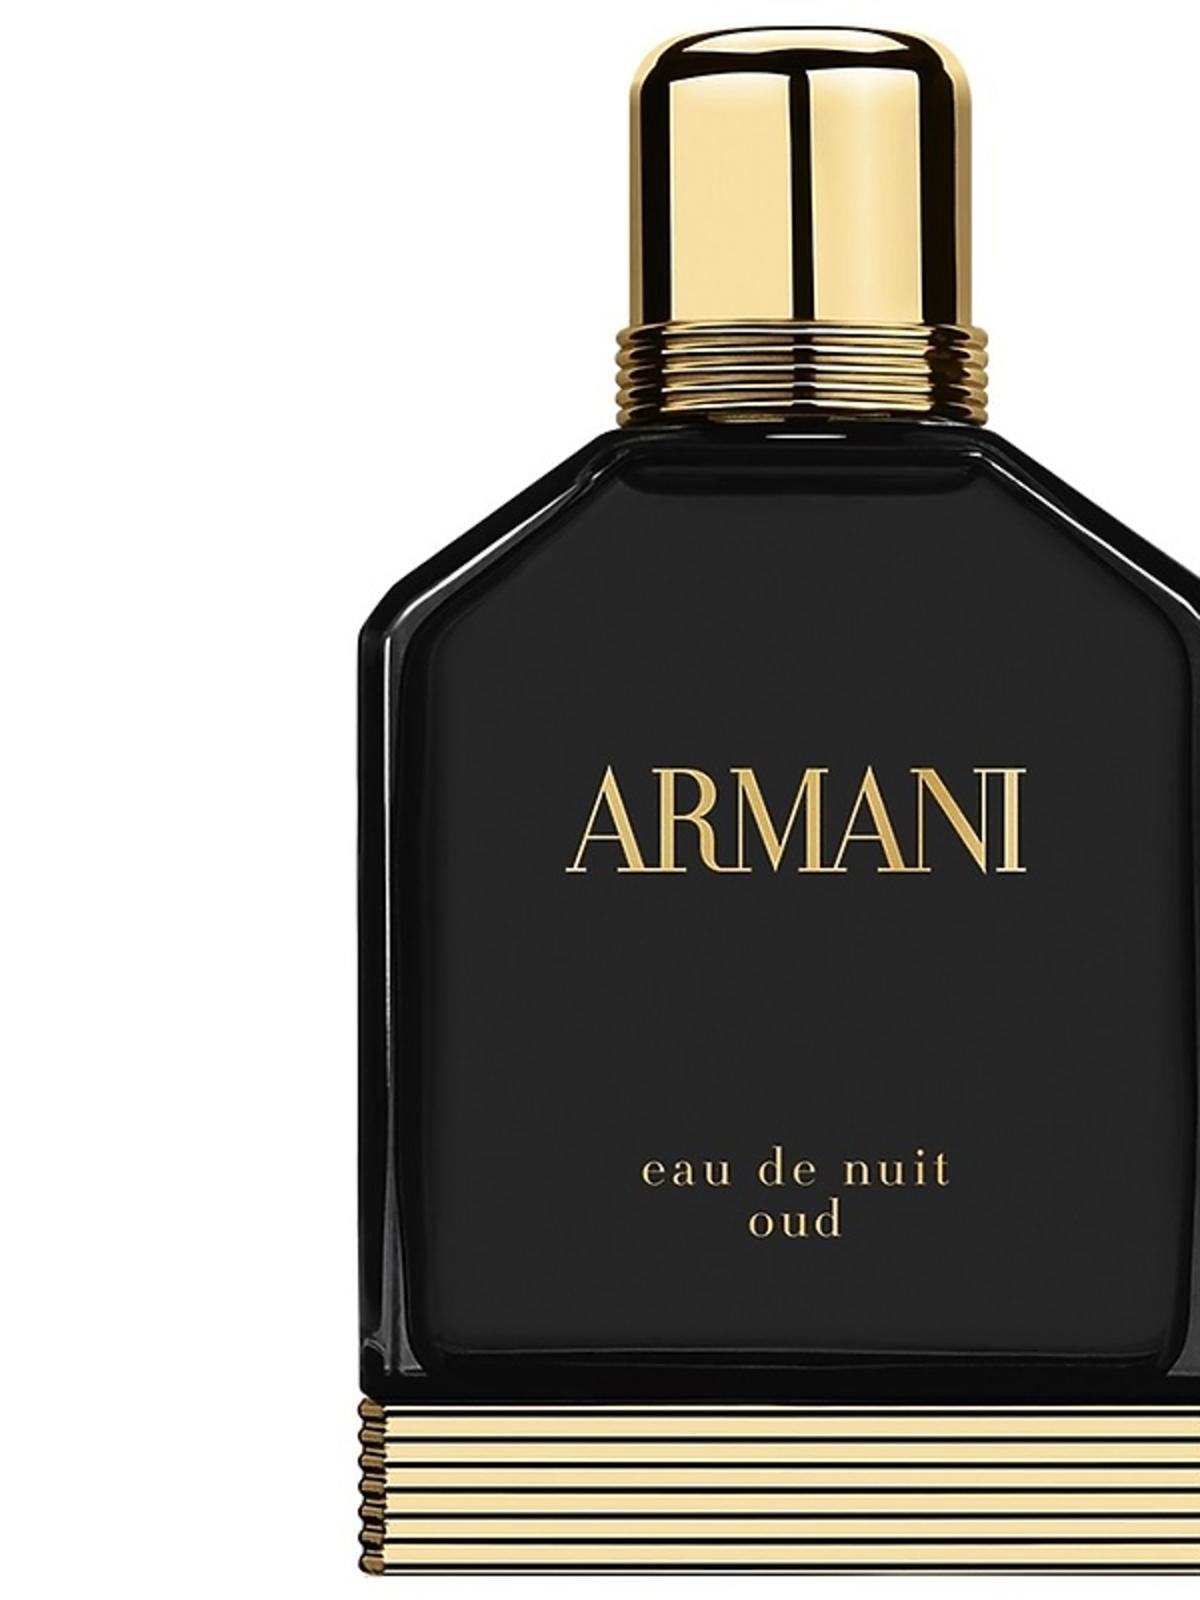 Perfumy - prezent na święta dla niego: Giorgio Armani La Collection Eau de Nuit Oud, EDP